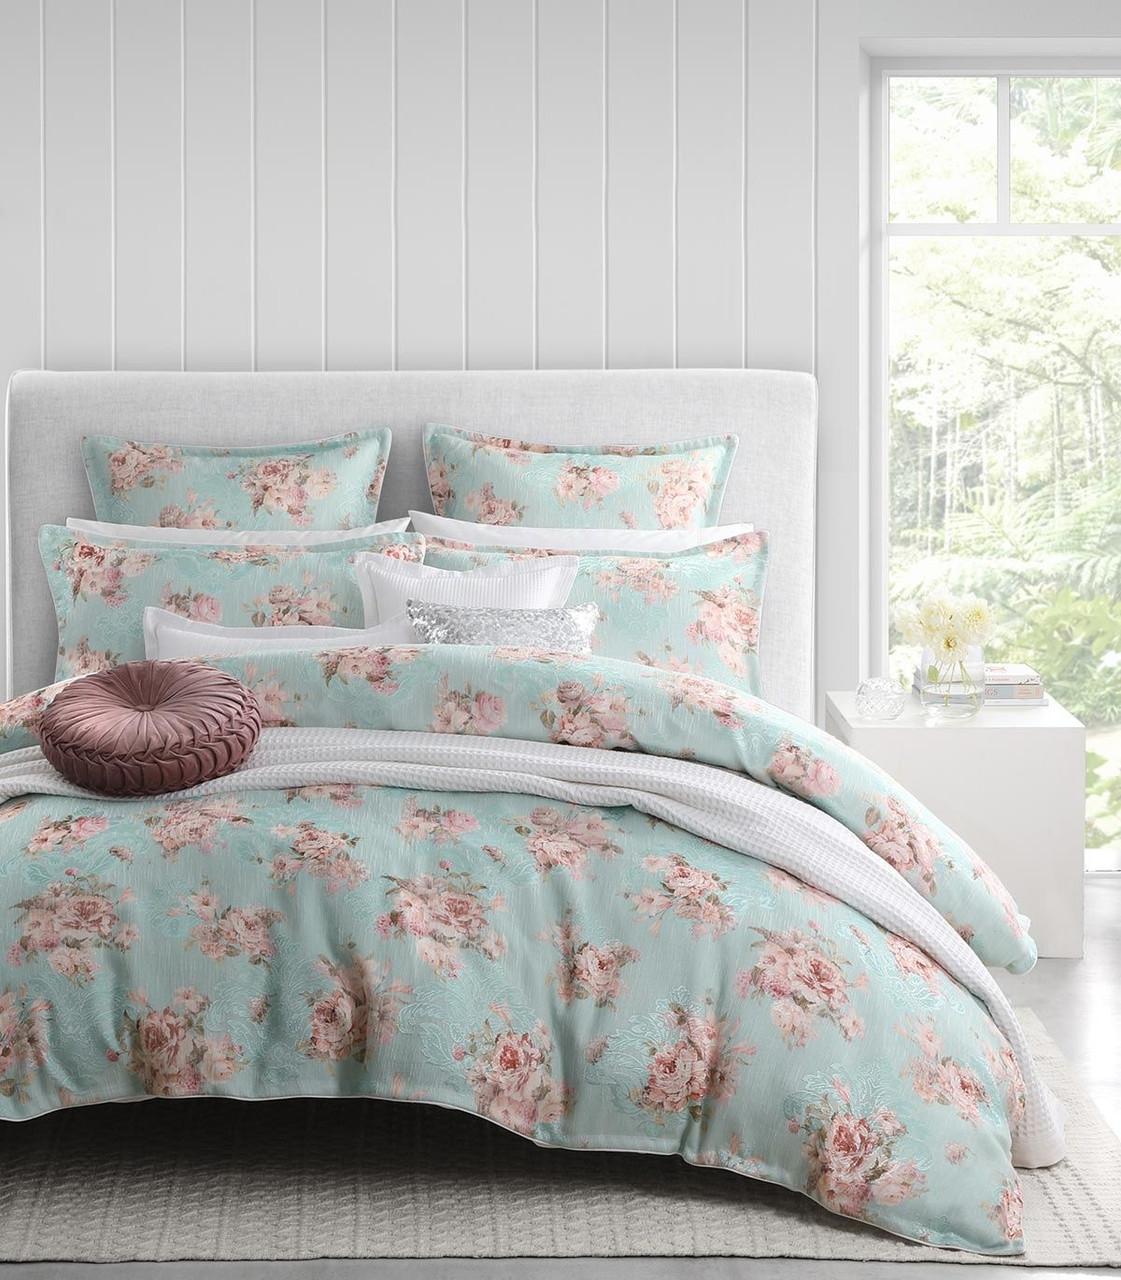 Floral Montara Super Mint King Quilt Cover Set By Logan Mason 3 Pce